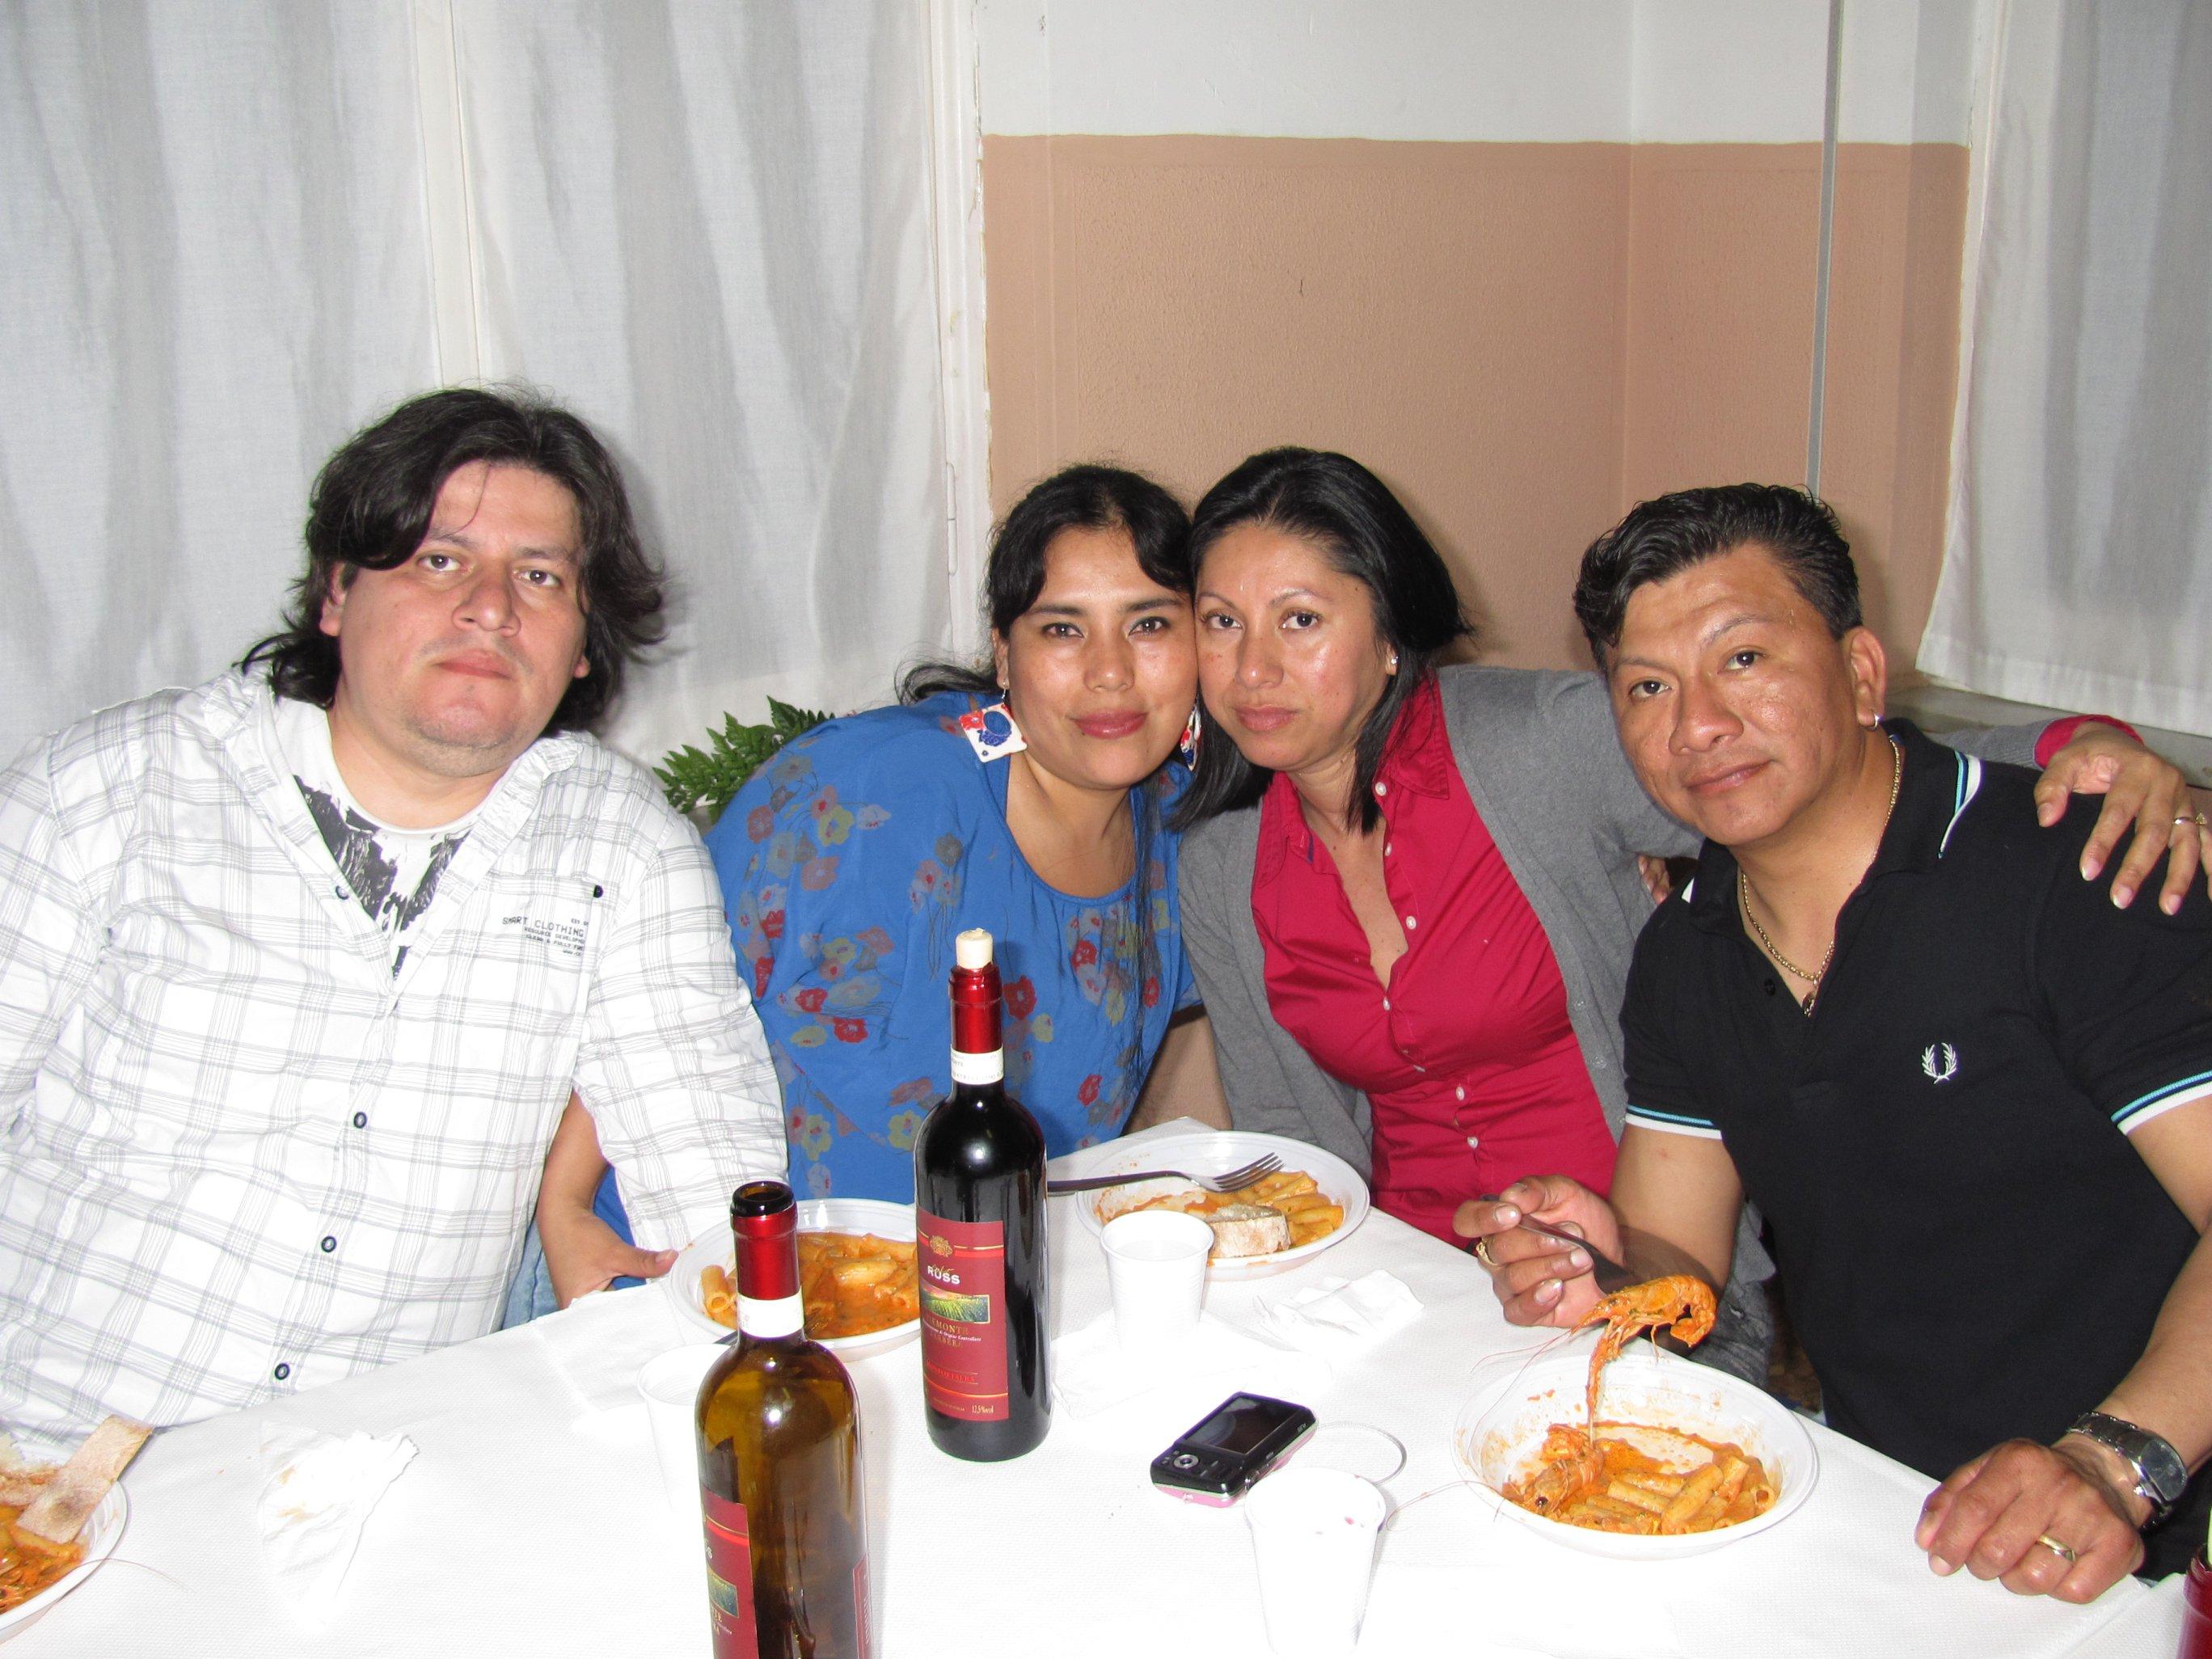 festa_madonna_2012-05-27-22-00-10